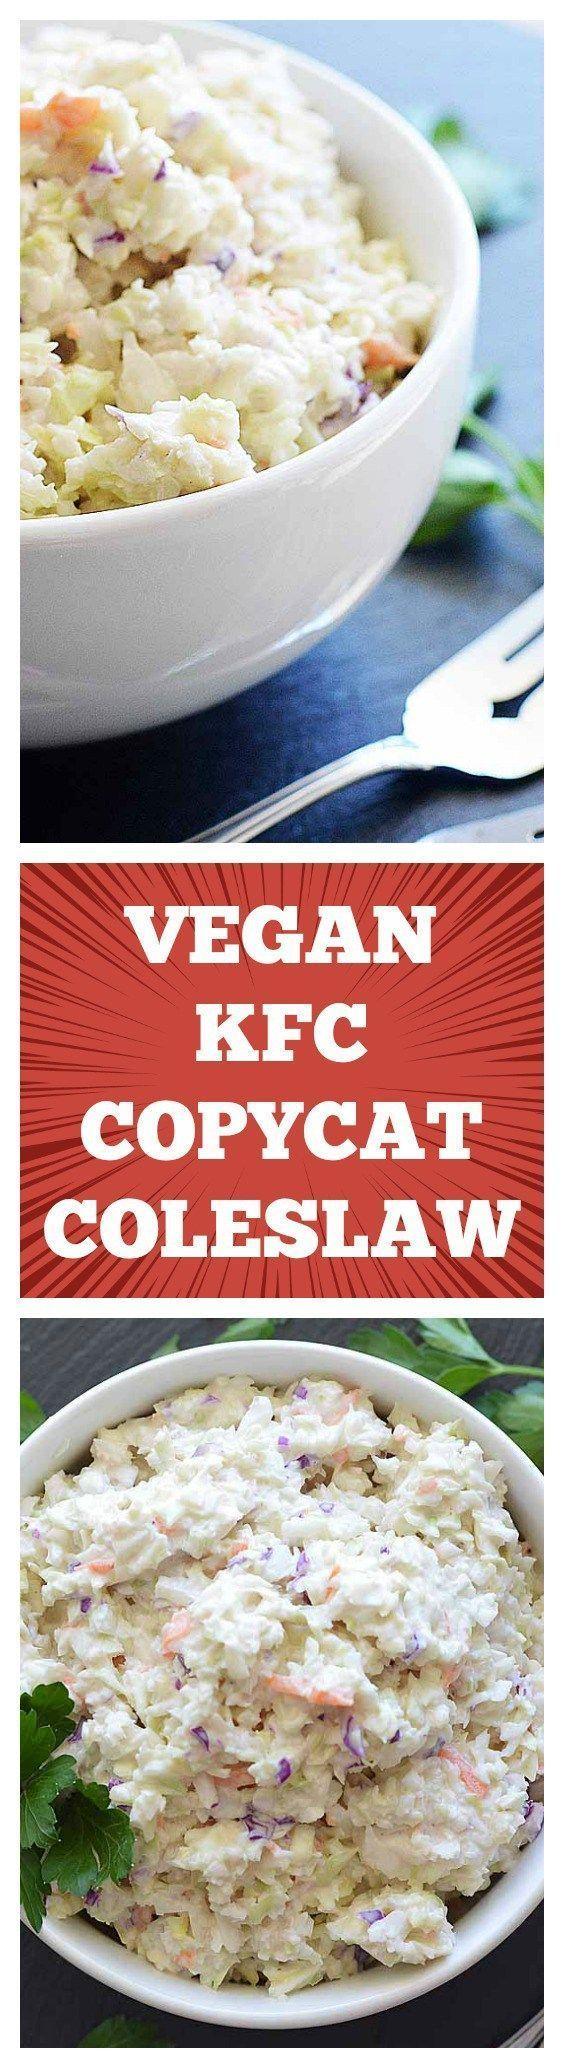 VEGAN KFC COPYCAT COLESLAW